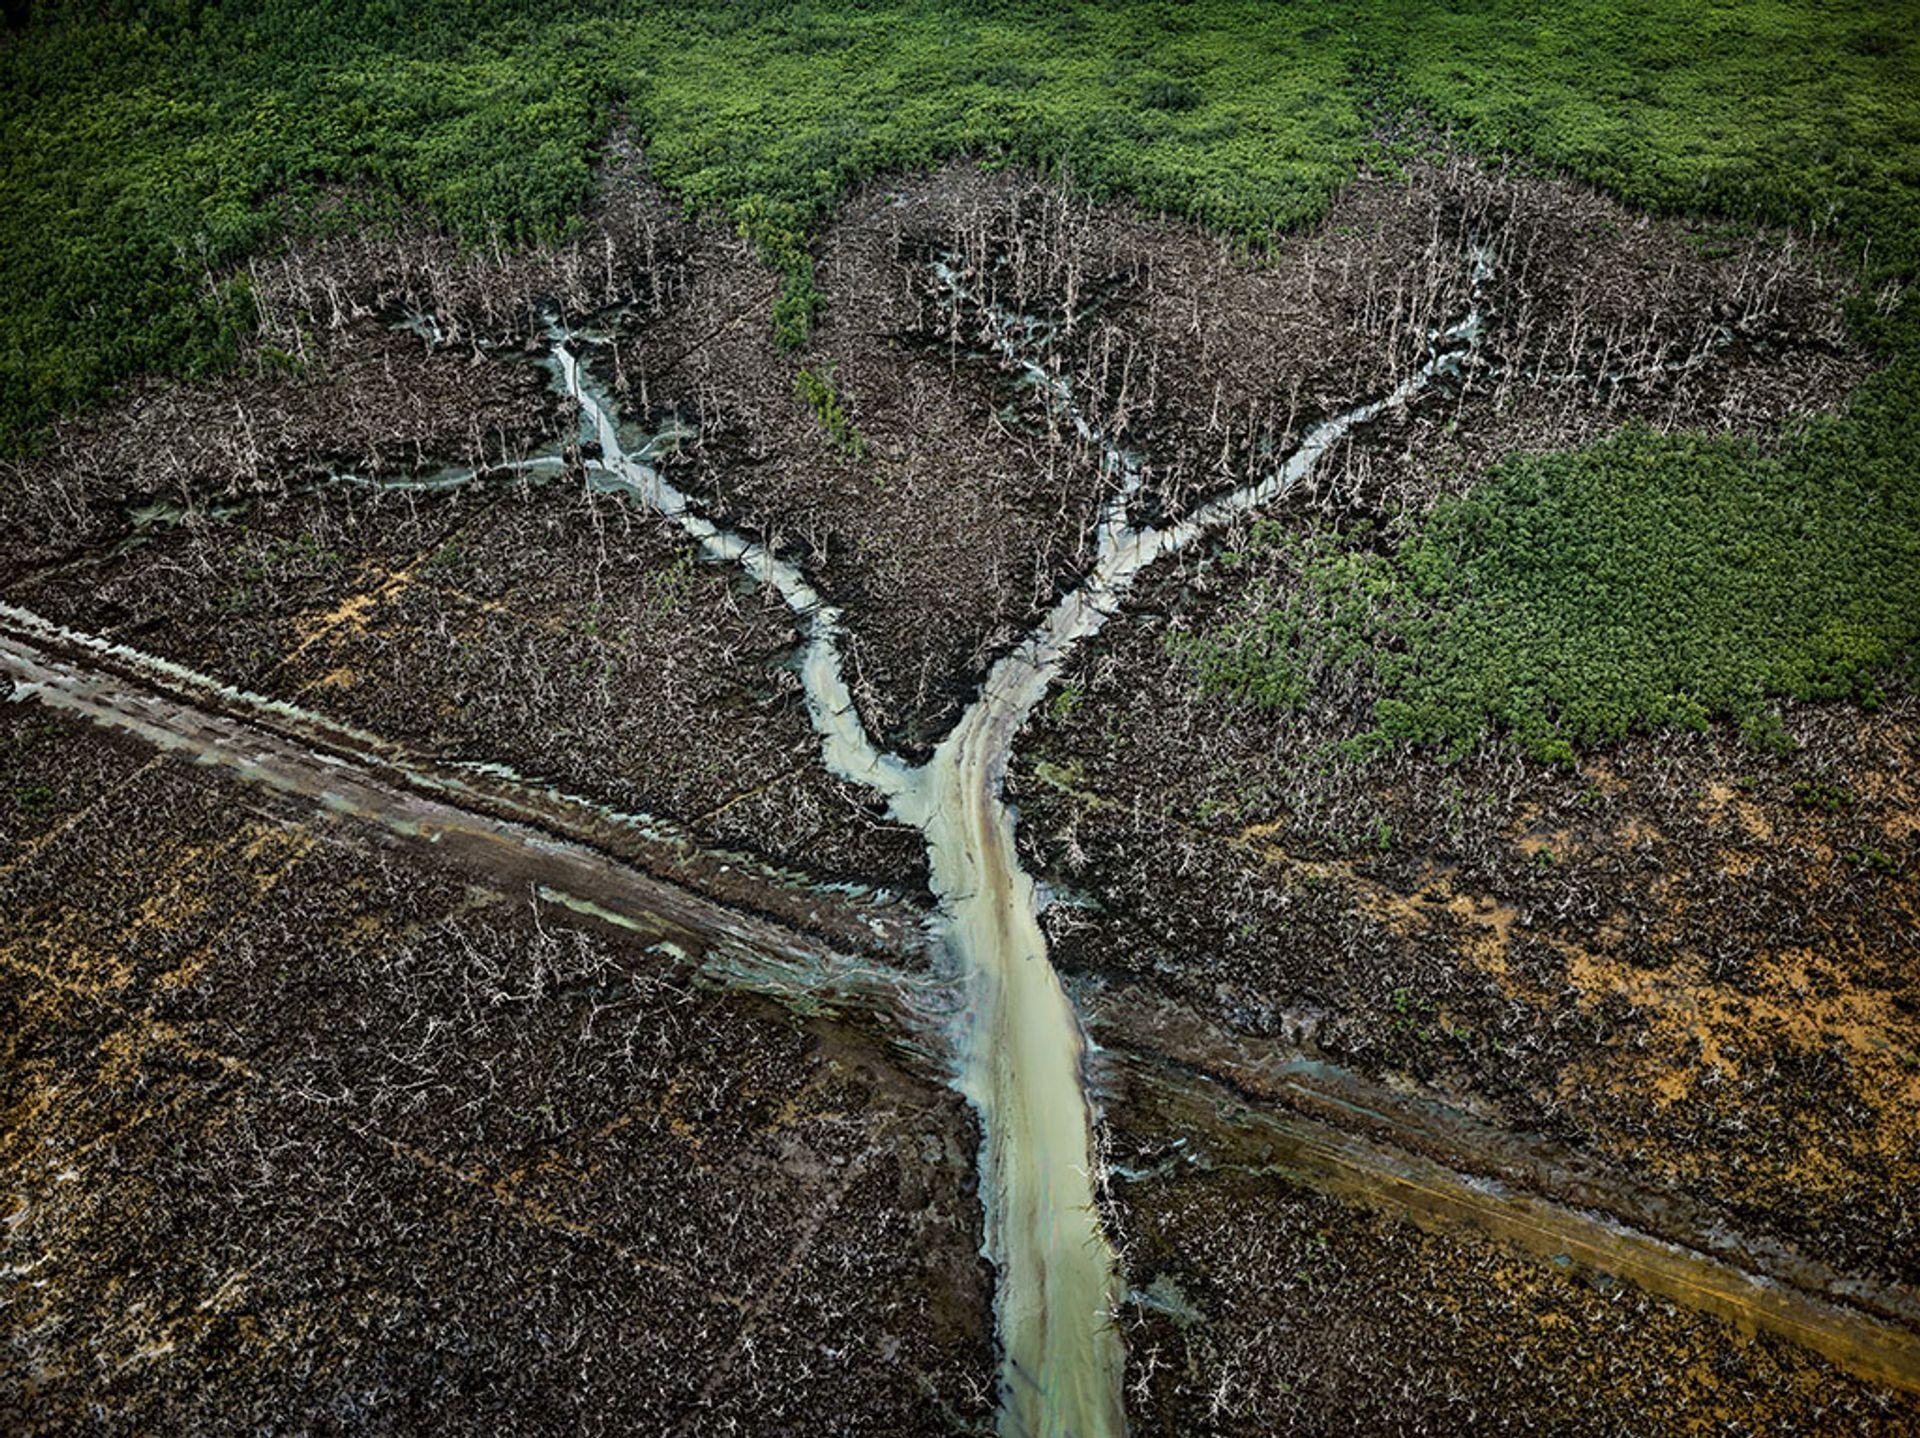 Oil Bunkering #2, Niger Delta, Nigeria, 2016 Edward Burtynsky, courtesy Metivier Gallery, Toronto / Flowers Gallery, London